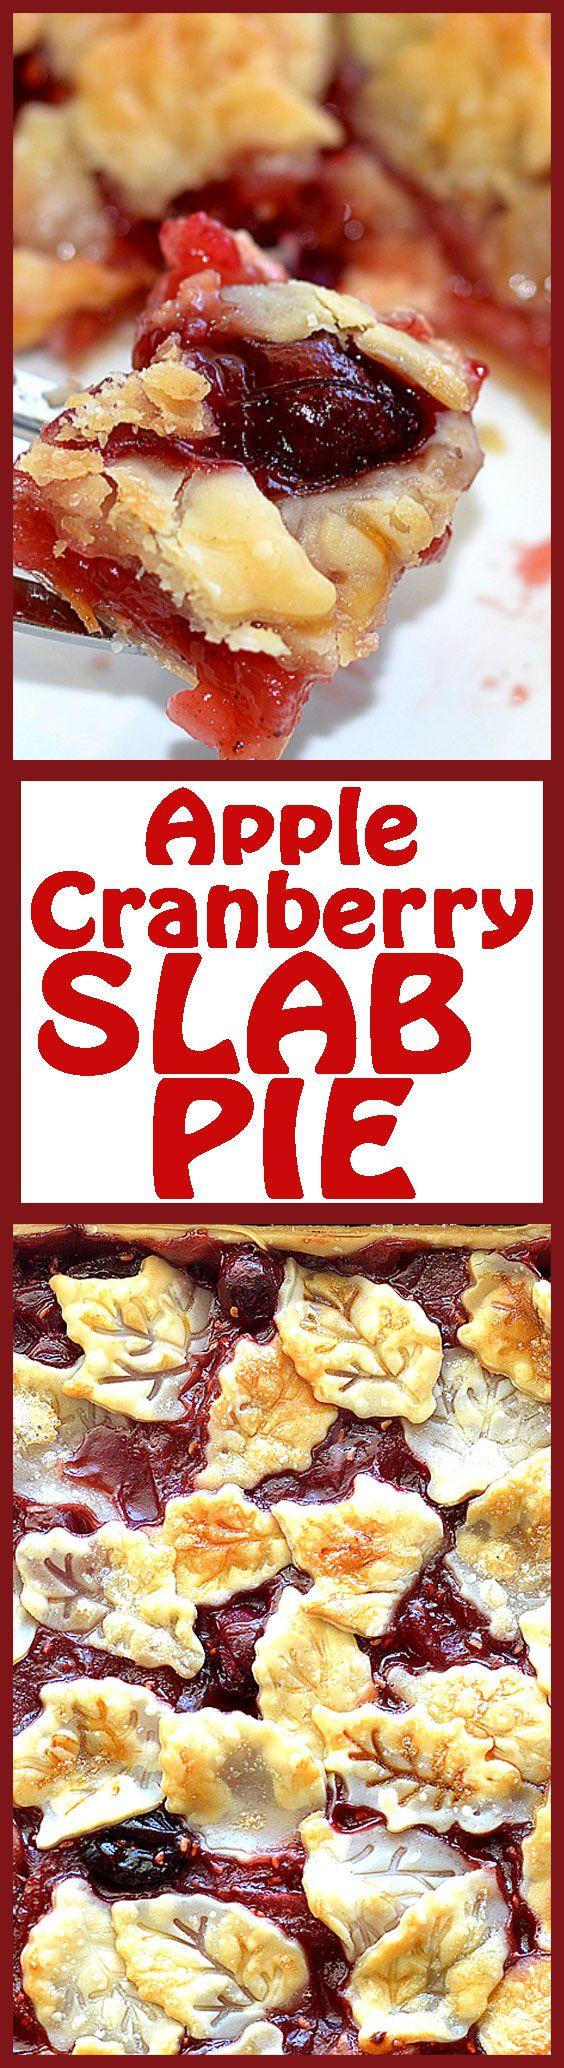 Vegan Apple Cranberry Slab Pie. I'm not the biggest fan of cranberry, but looks good